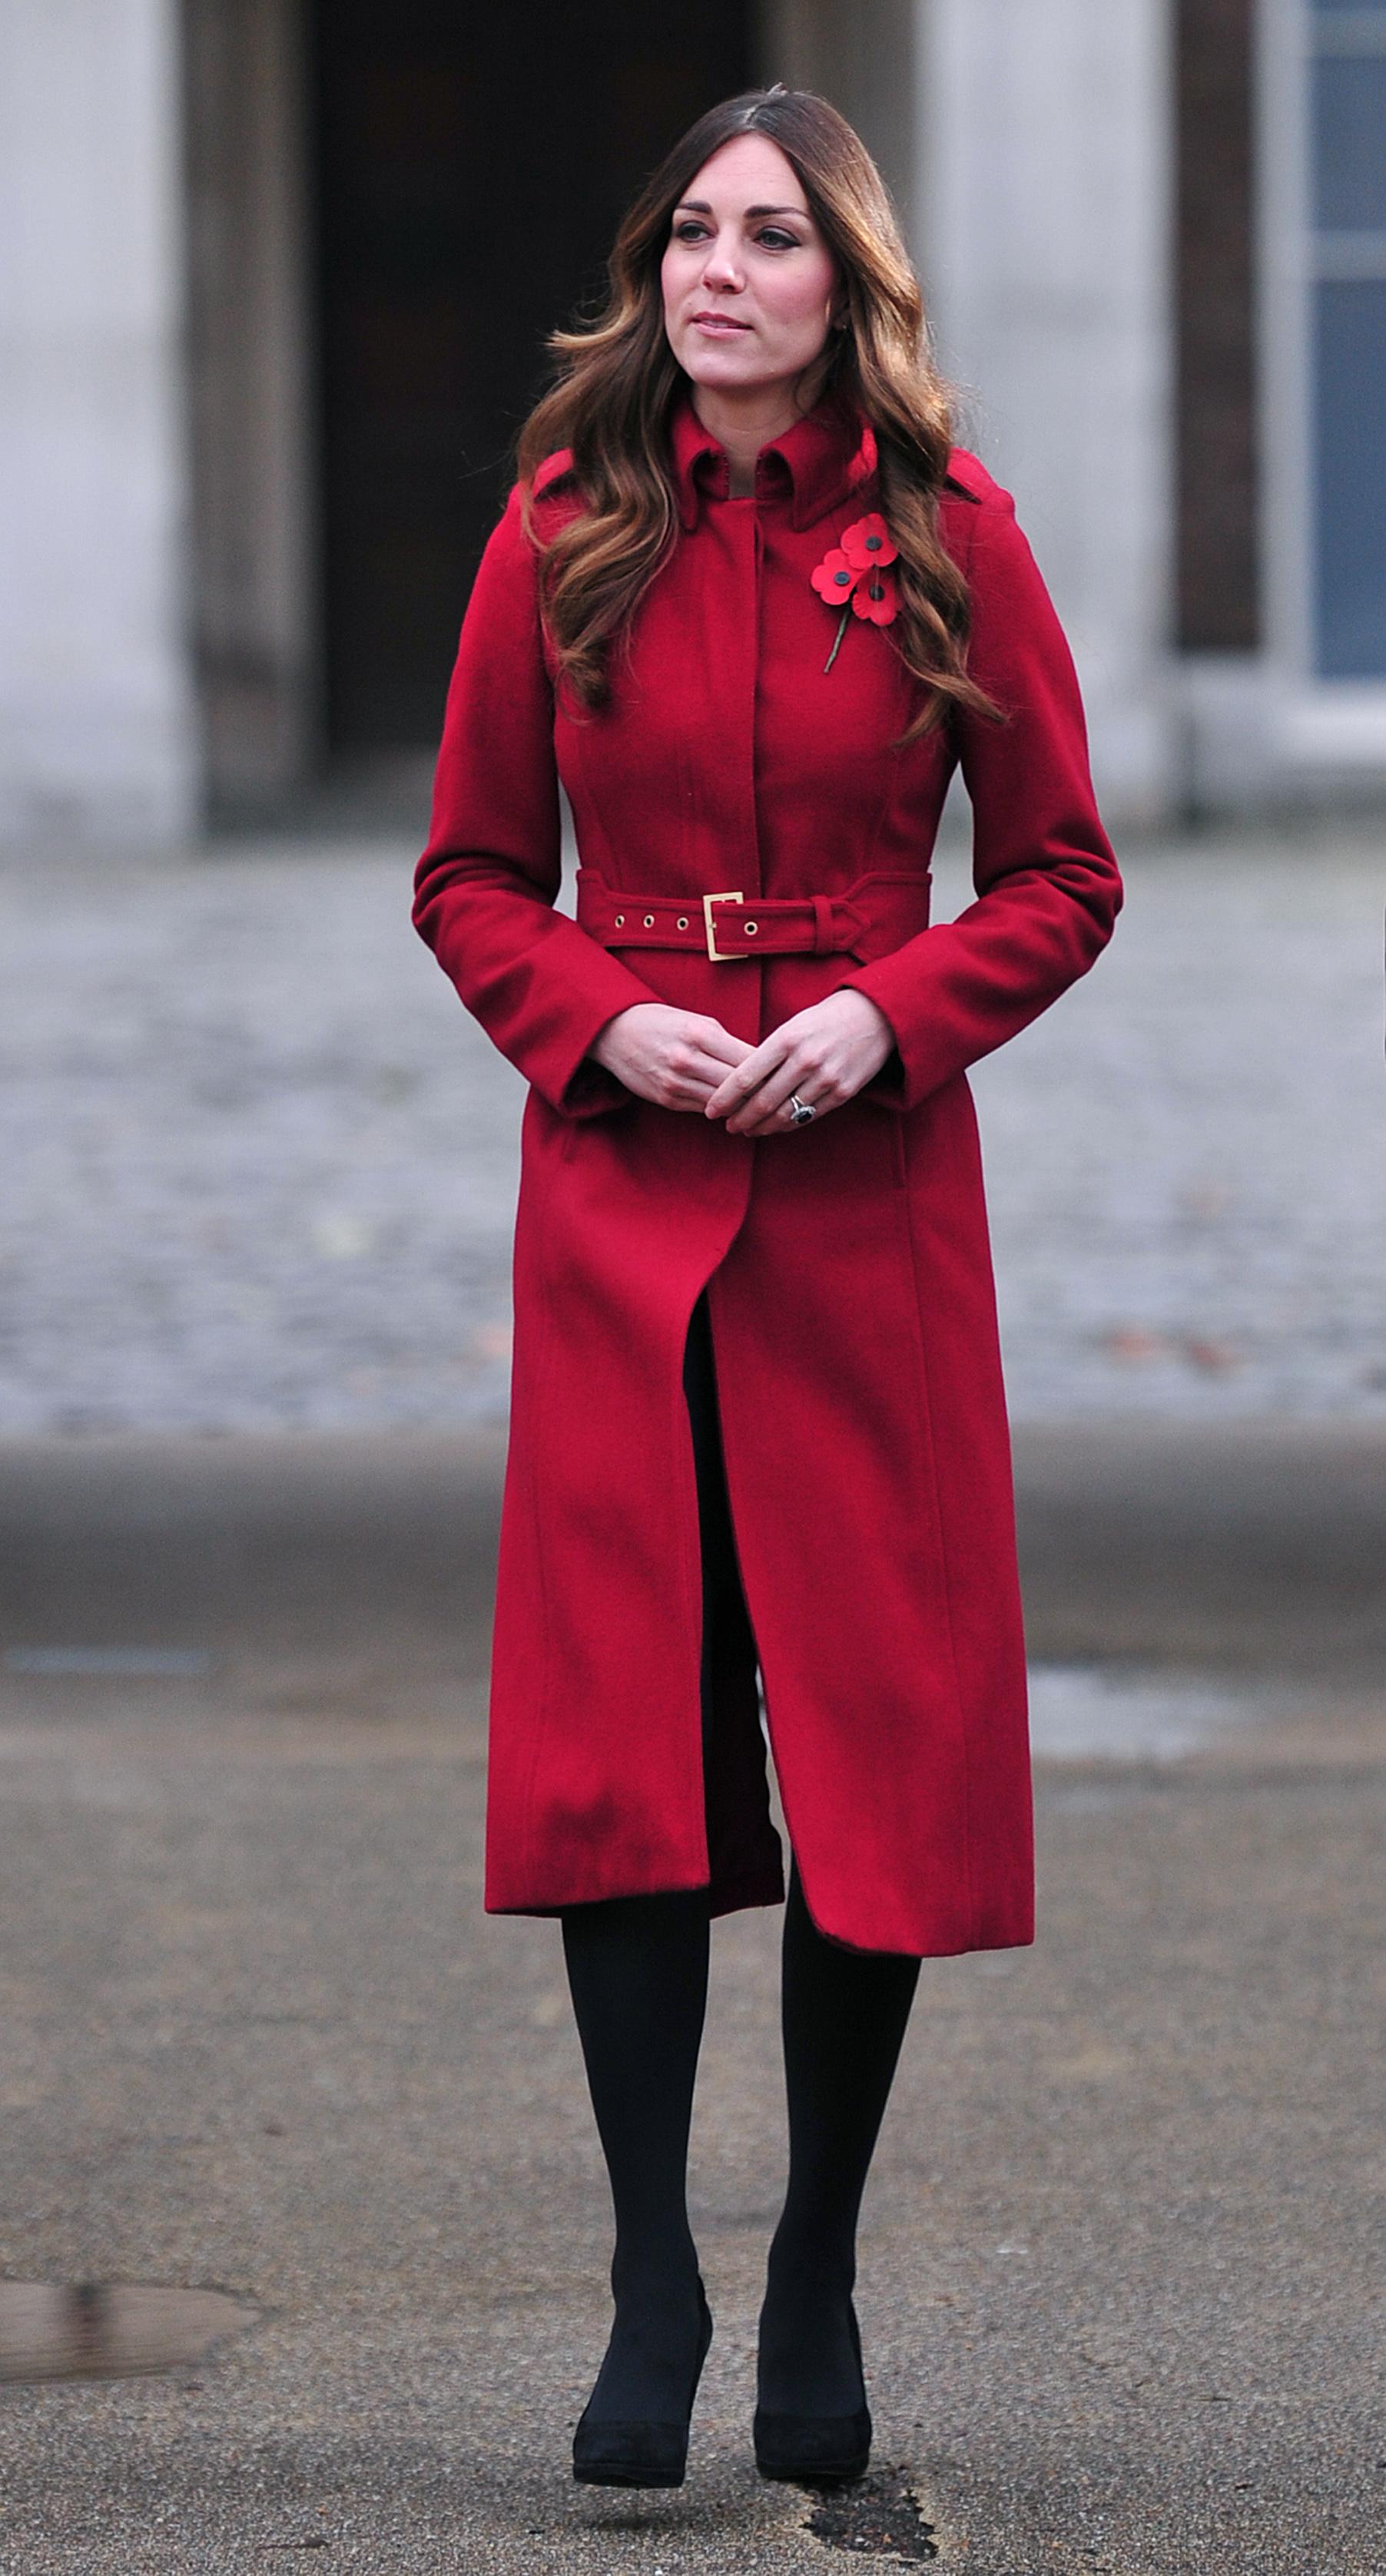 Кейт Миддлтон пообщалась волонтерами в рамках The Annual London Poppy Day